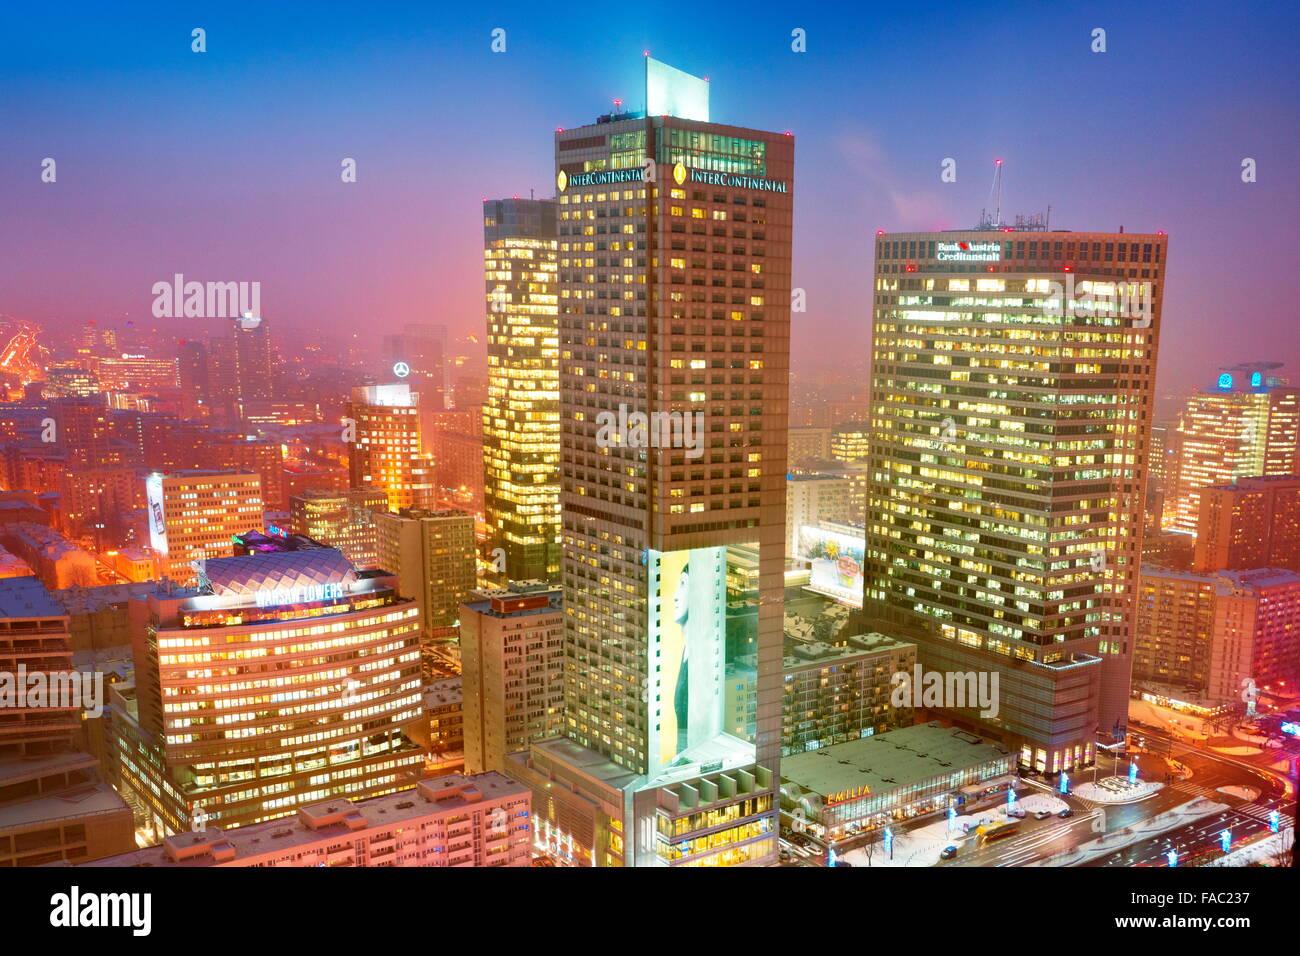 Varsavia quartiere moderno skyline, Polonia Immagini Stock